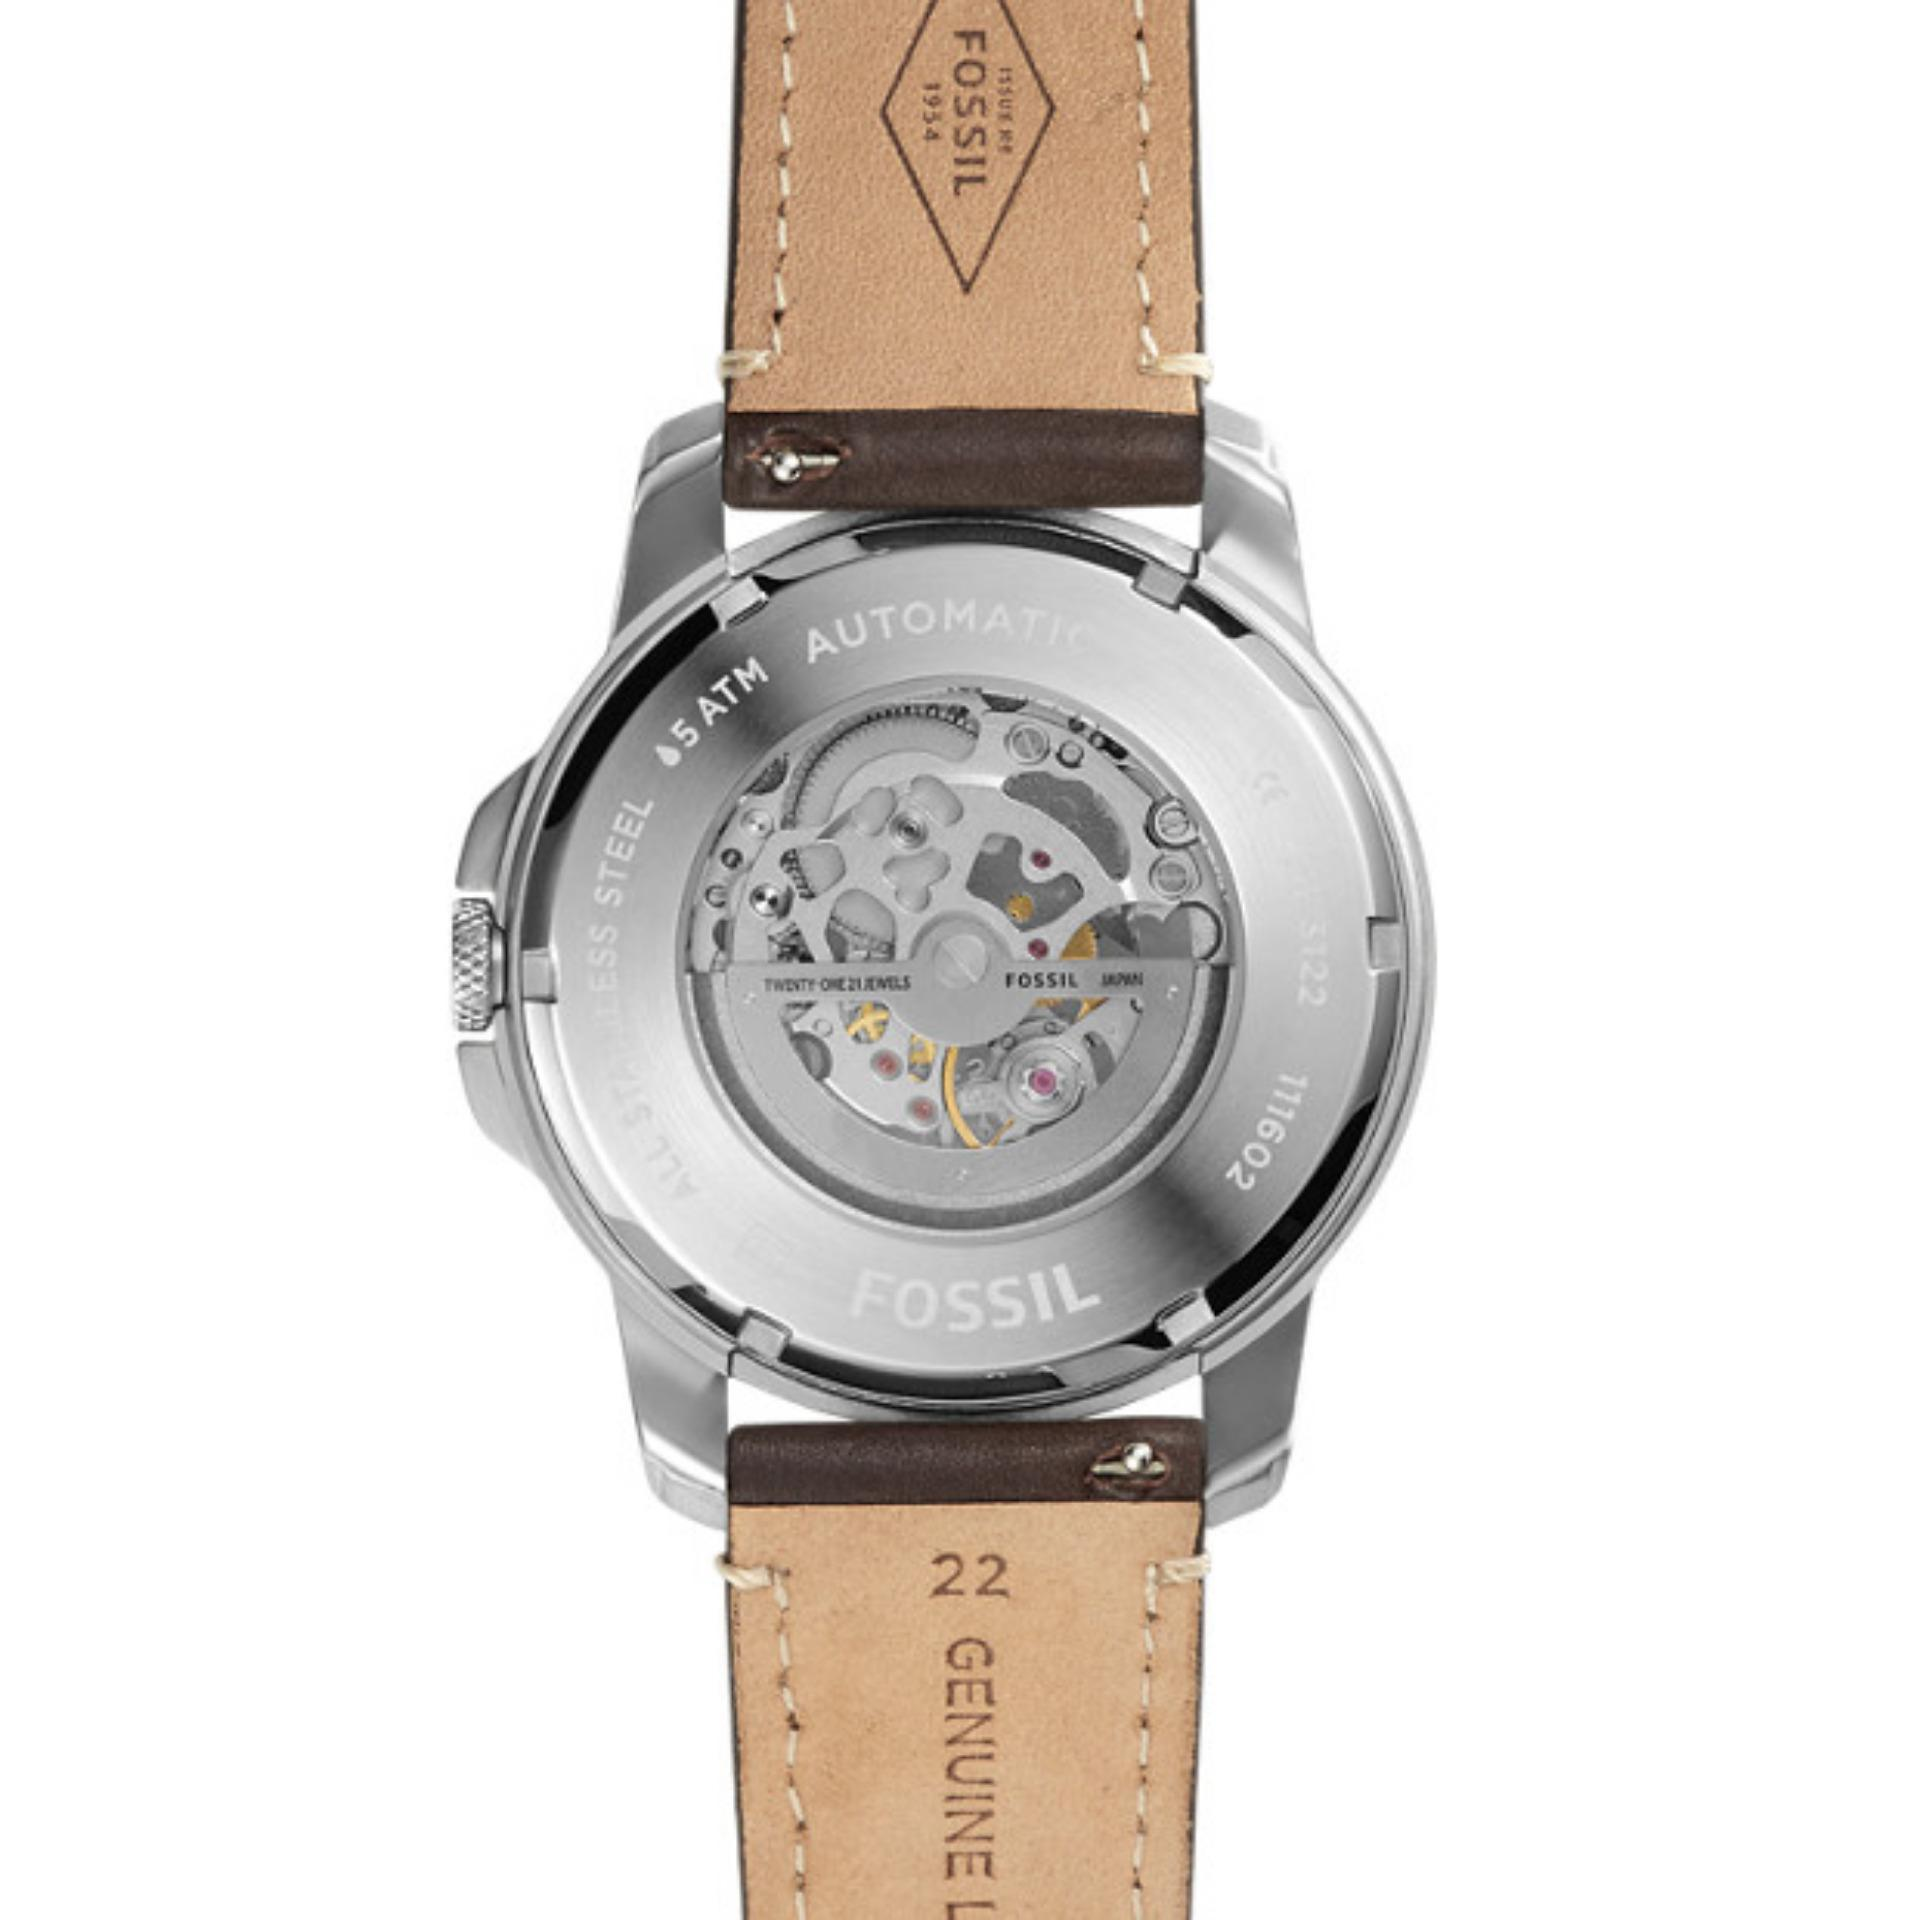 Fossil Ch2891 Jam Tangan Pria Leather Brown Daftar Update Harga Fs5075 Strap Silver Me3122 Grant Chronograph Dark Watch